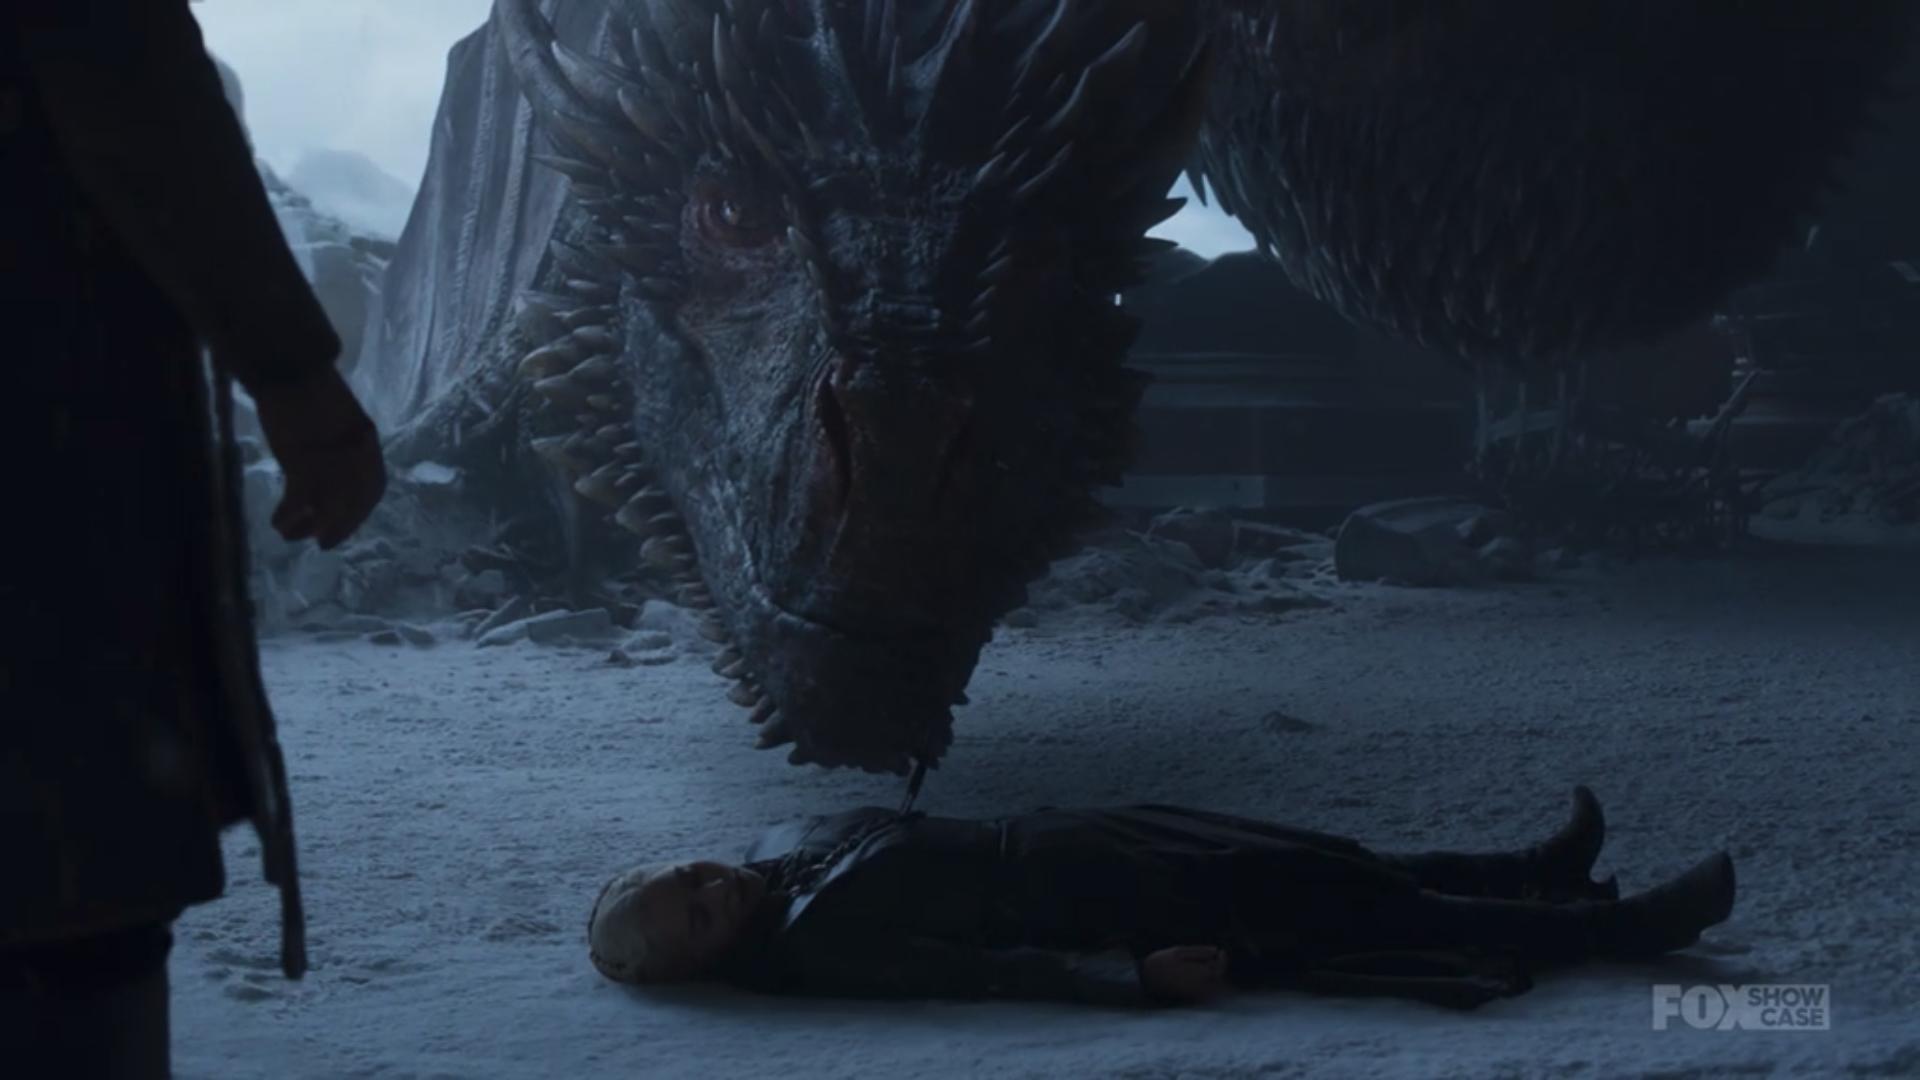 Credit: HBO/Foxtel